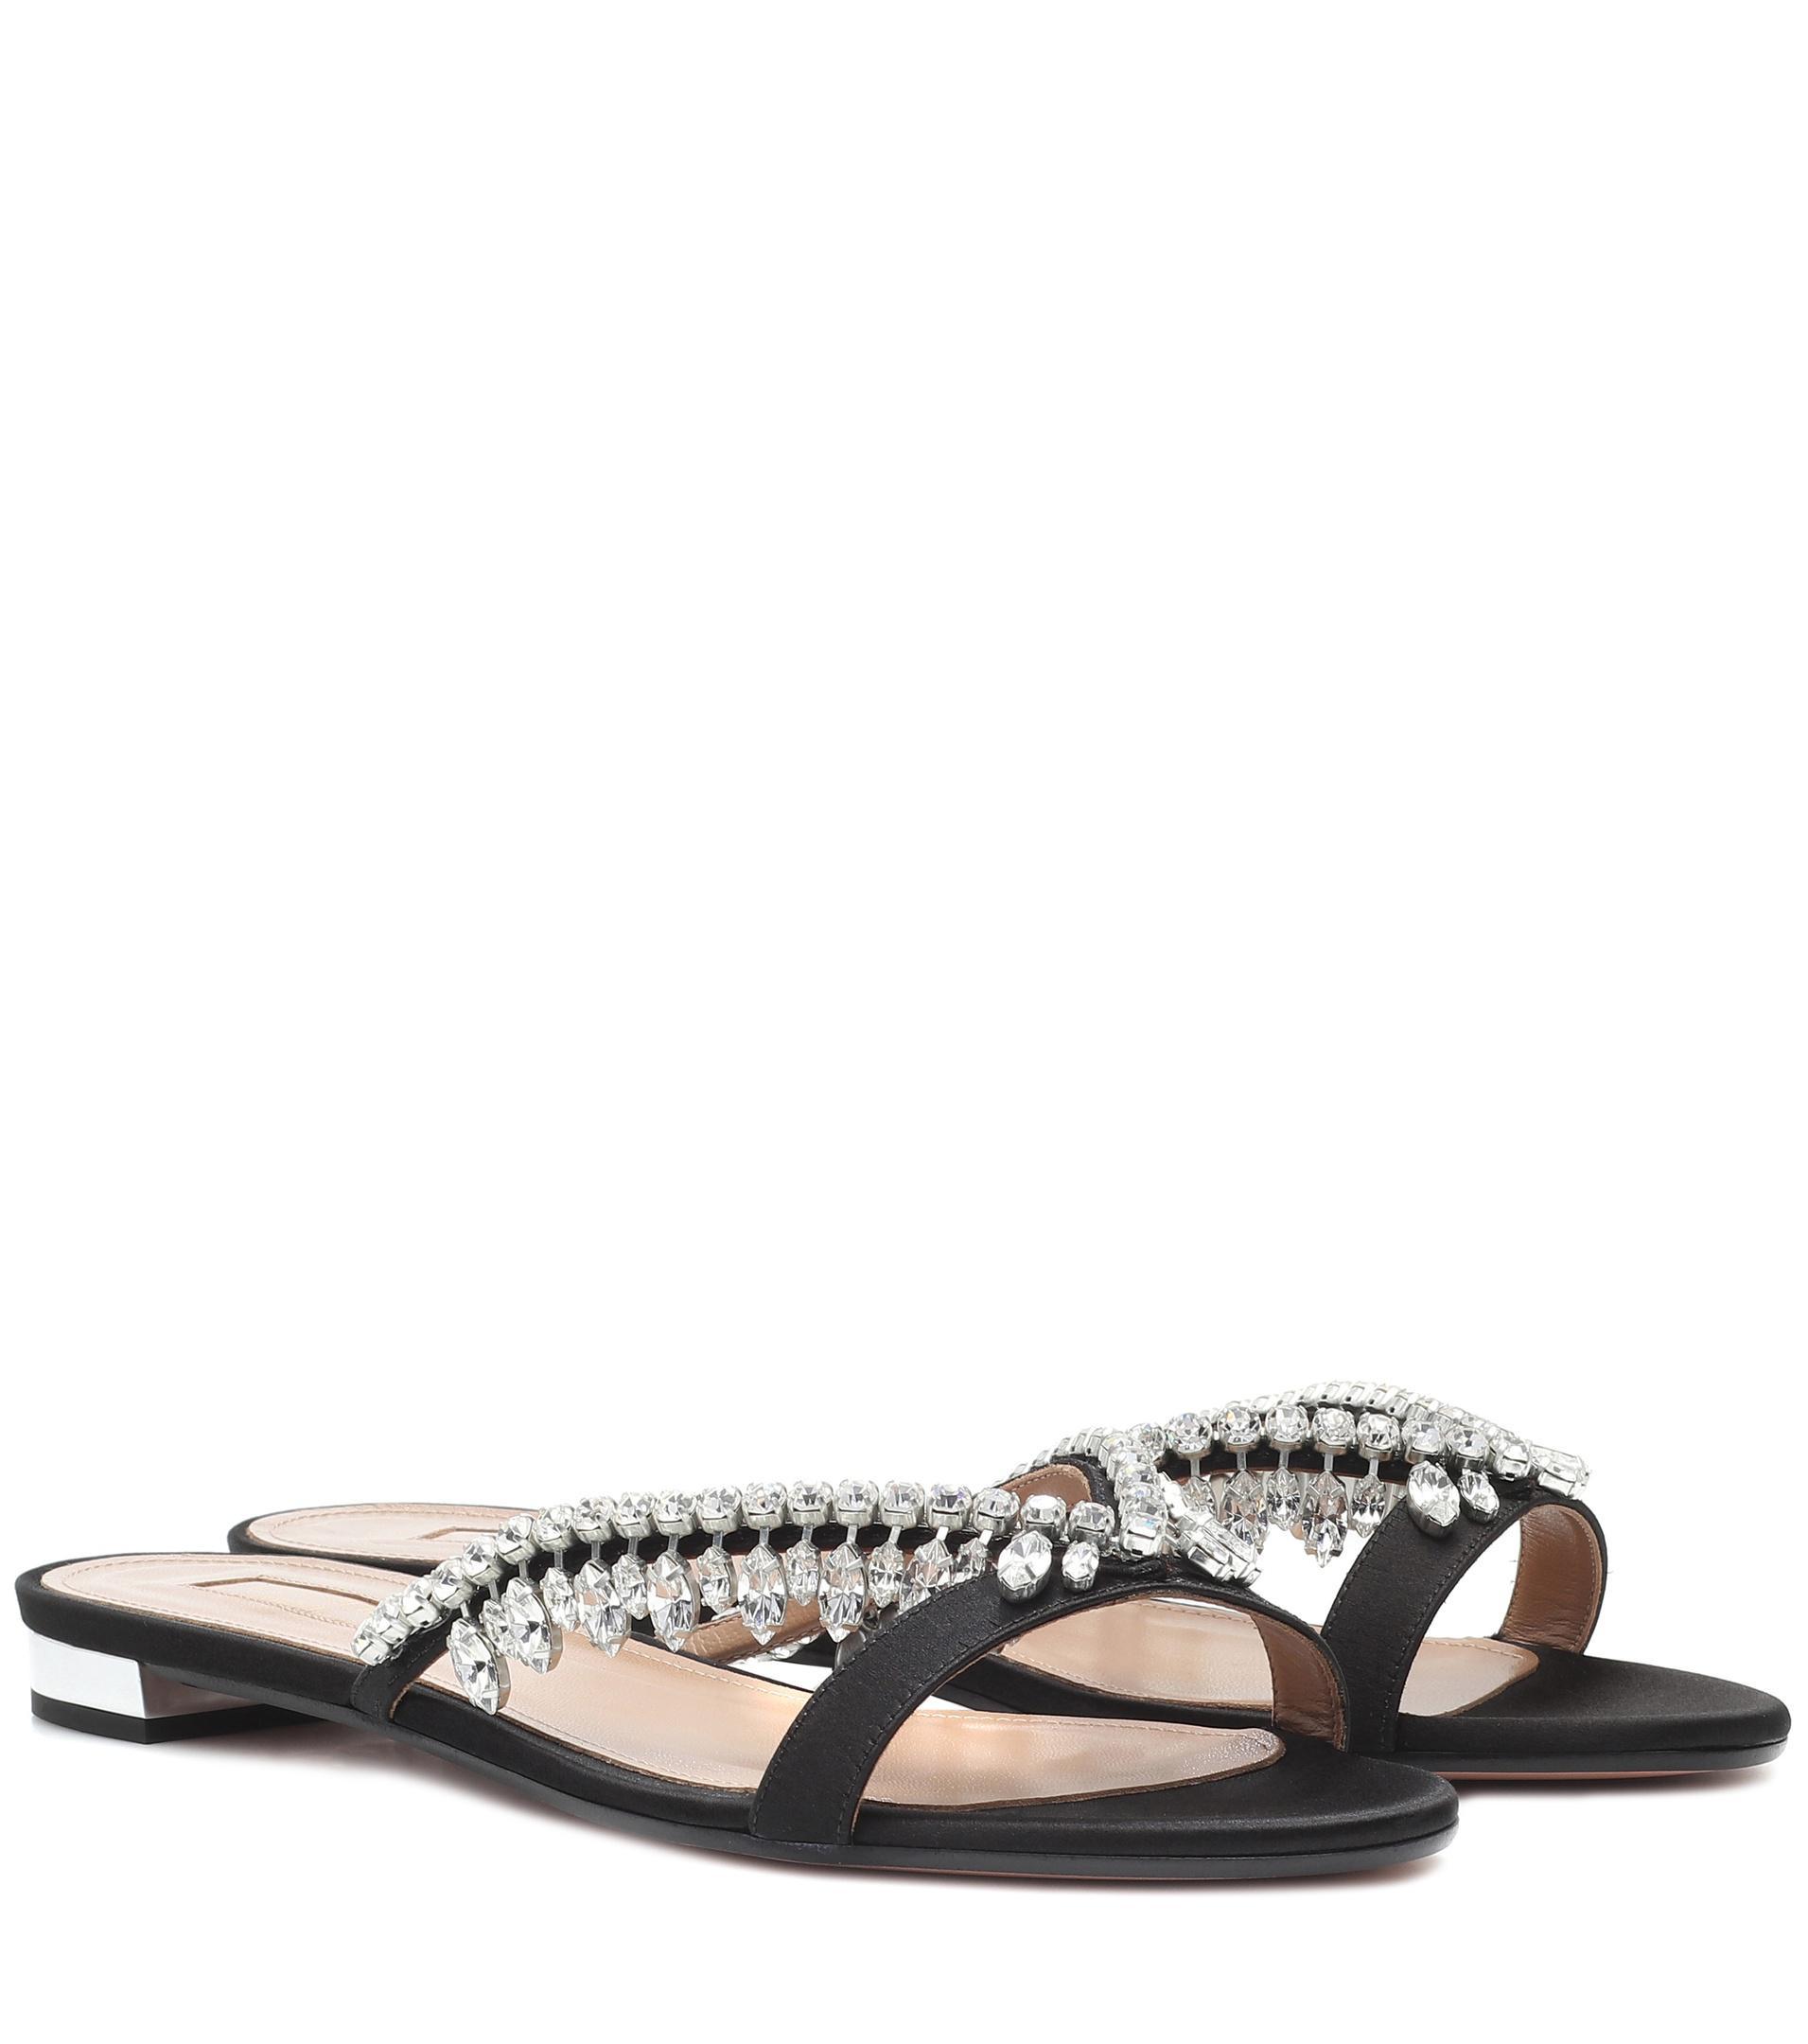 fa390568c Lyst - Aquazzura Gem Palace Satin Sandals in Black